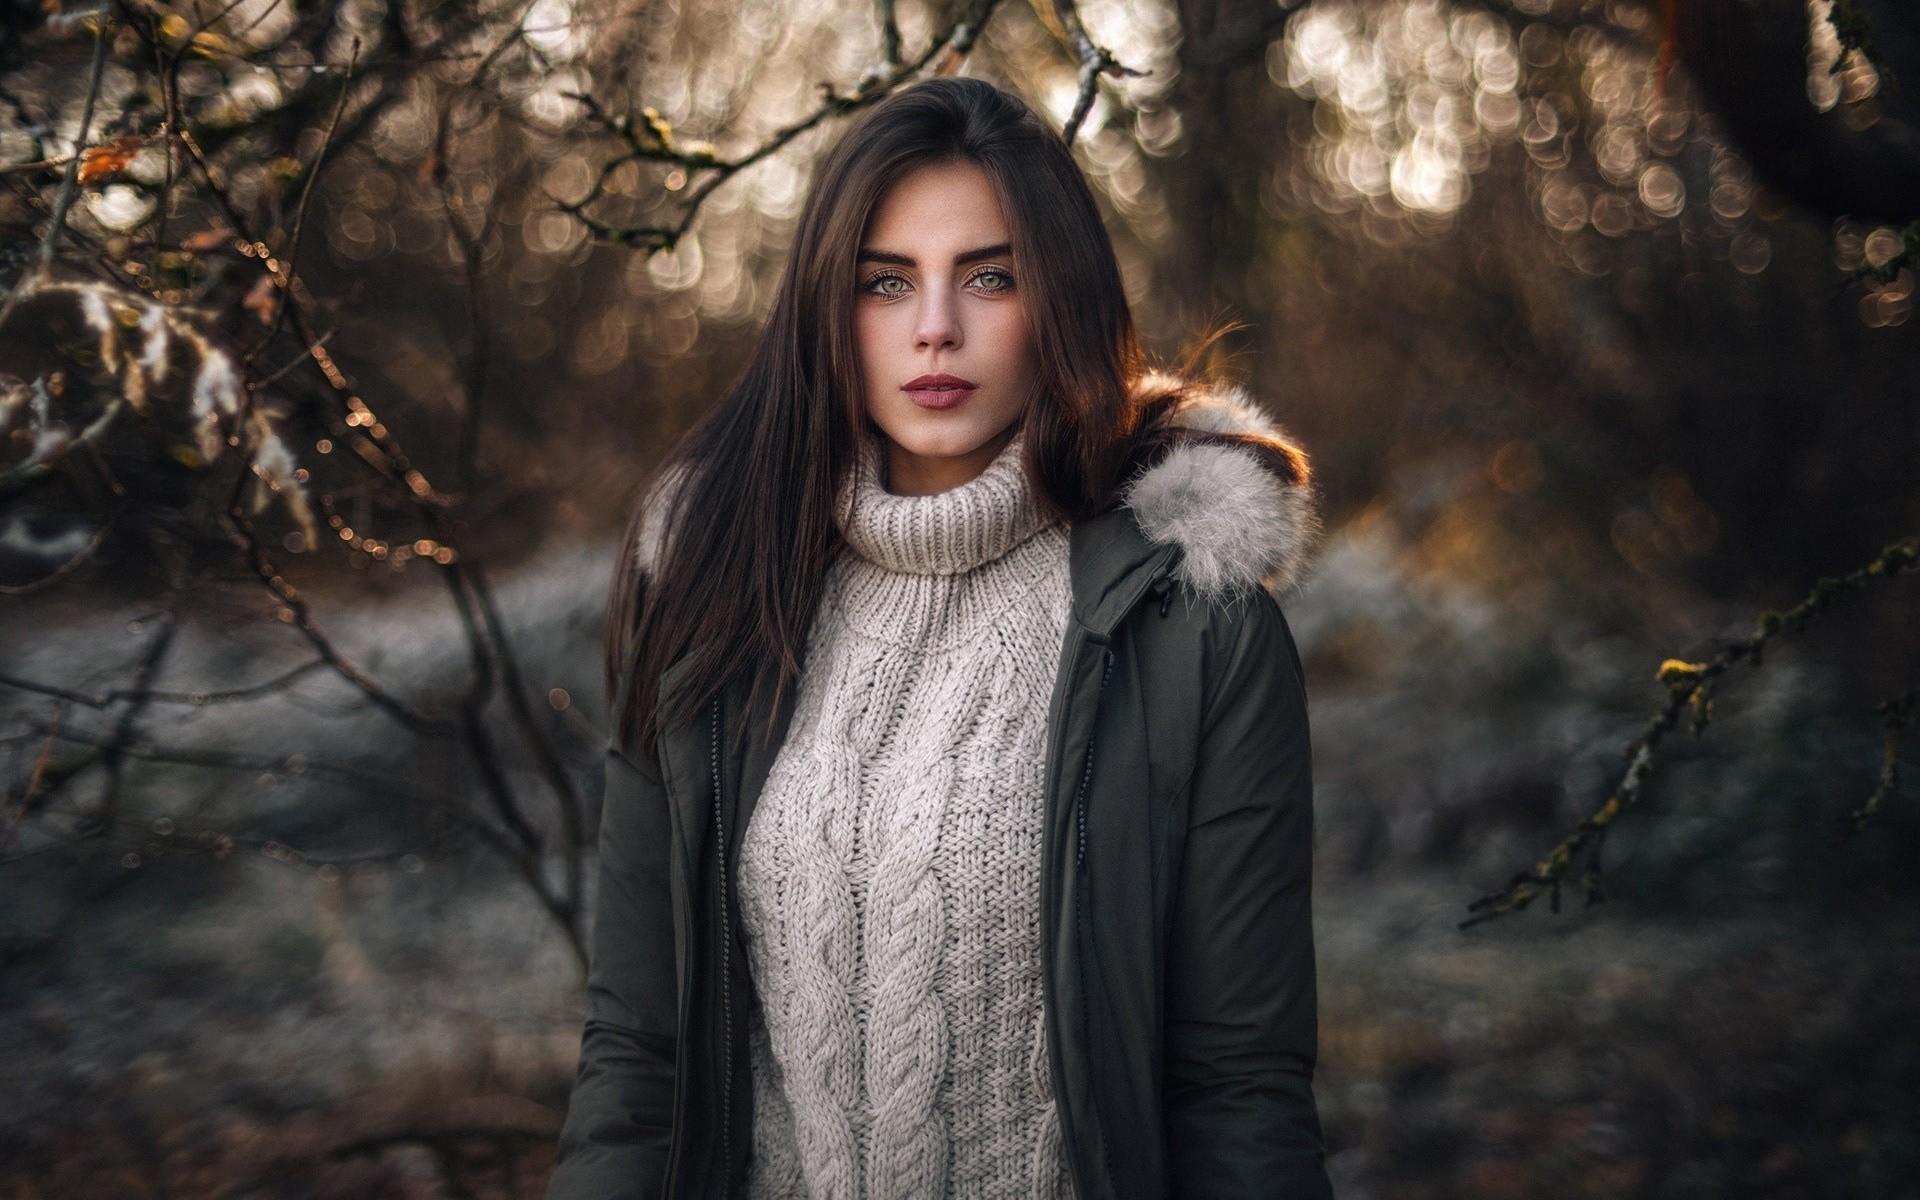 forest women outdoors women model portrait outdoors winter sweater fashion fur spring autumn beauty